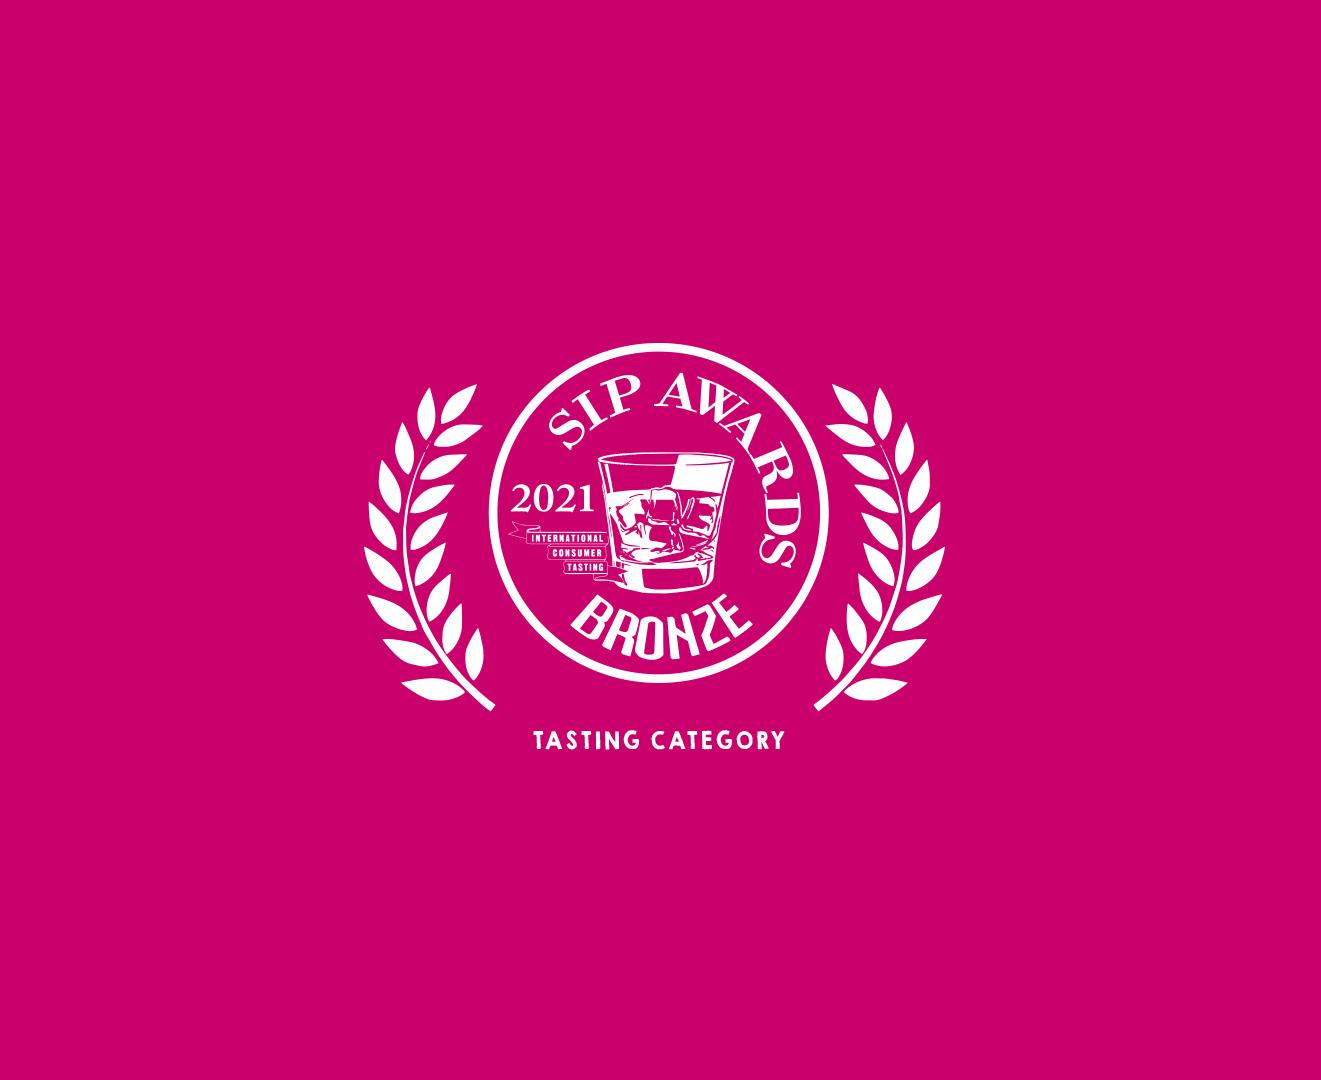 bg-award-sip-2021-bronze